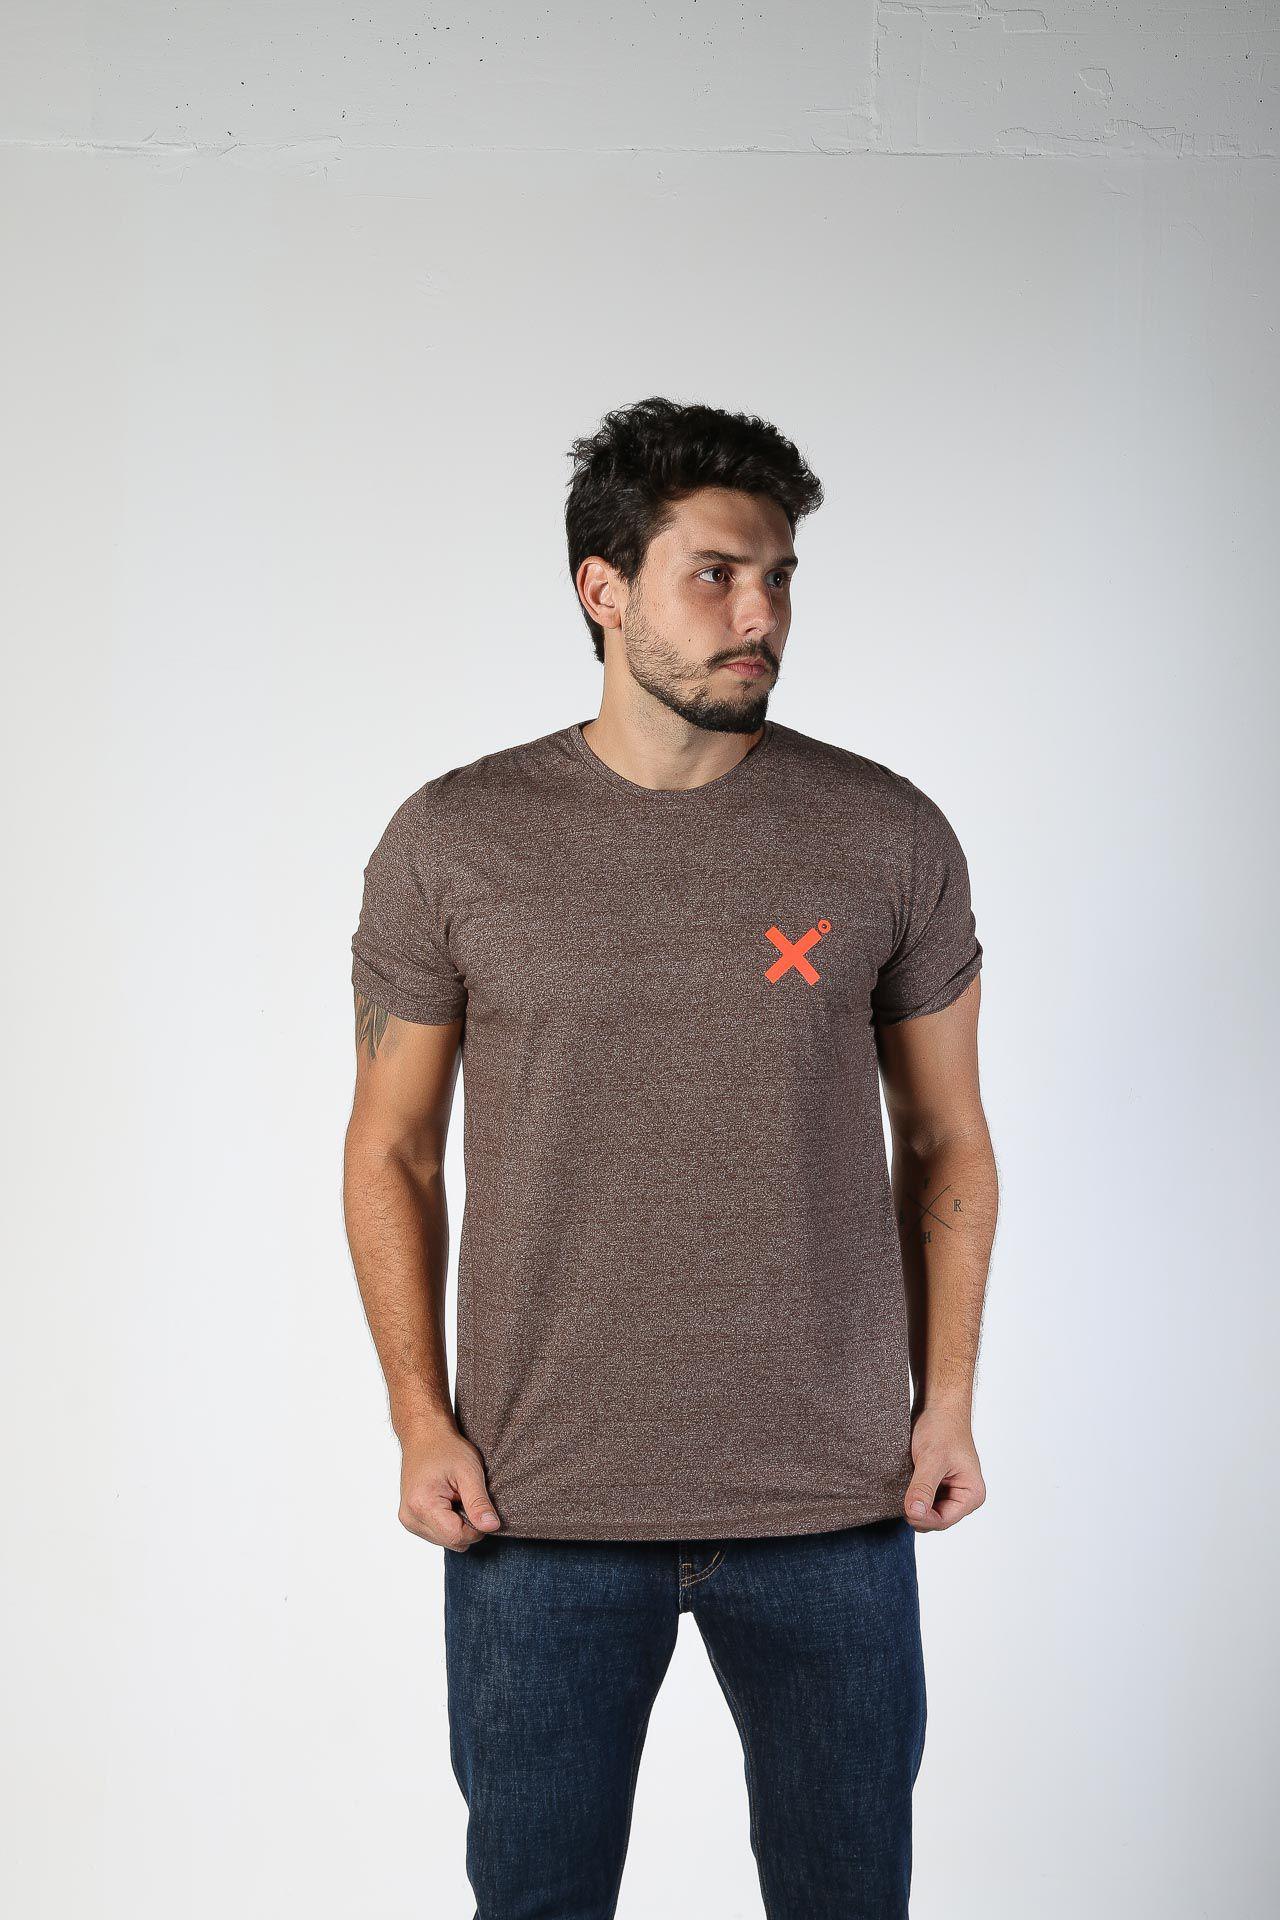 Camiseta Masculina TXC 1790